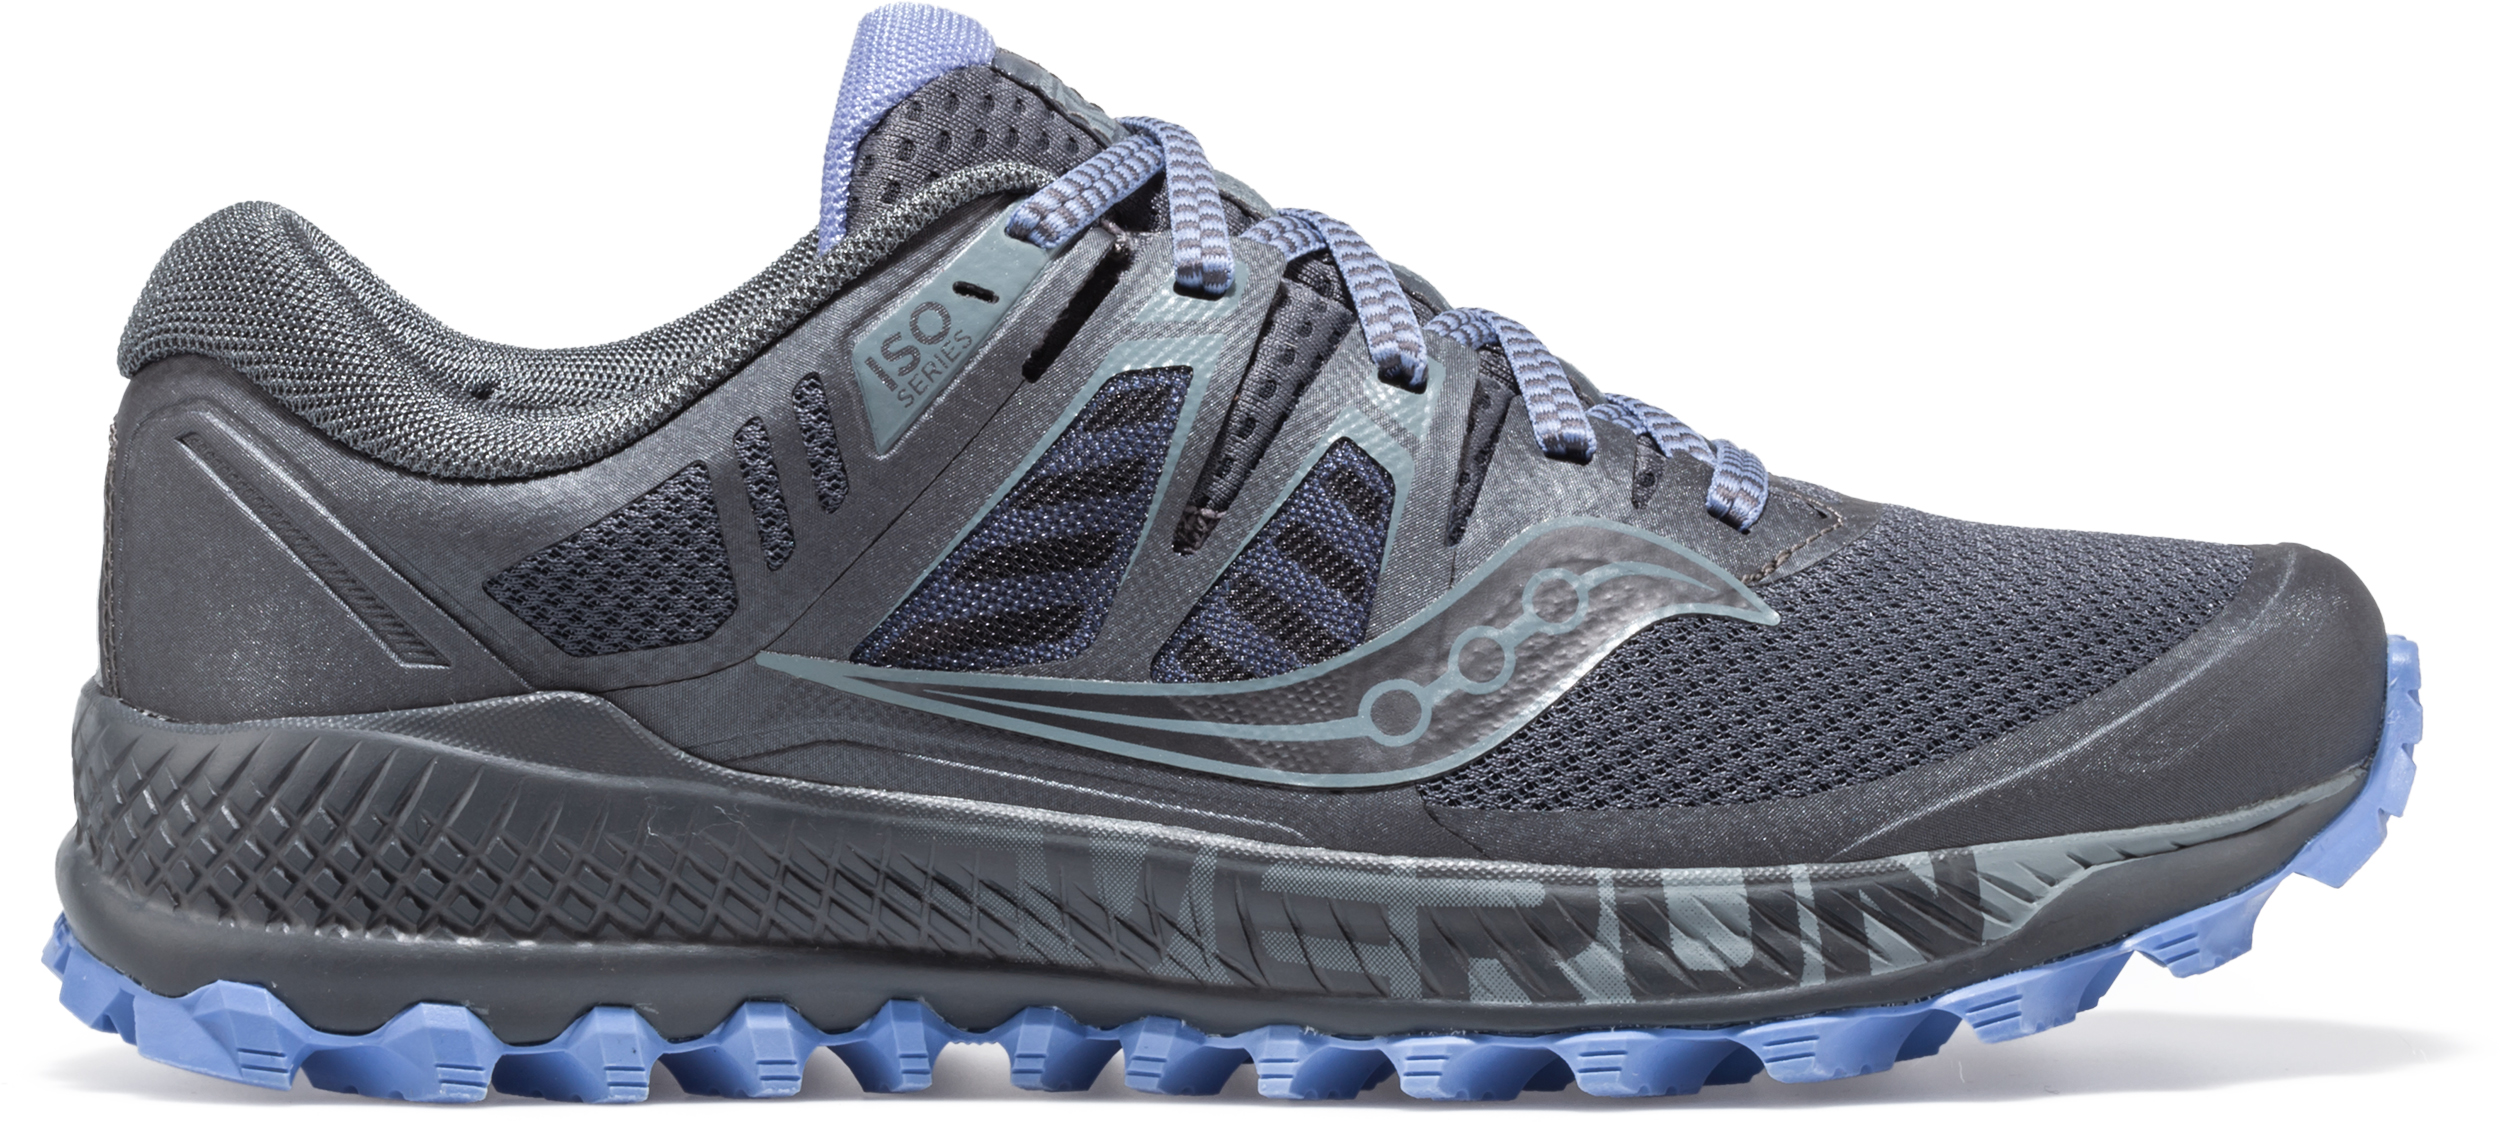 0d582e9f242ad Women's Trail running shoes | MEC